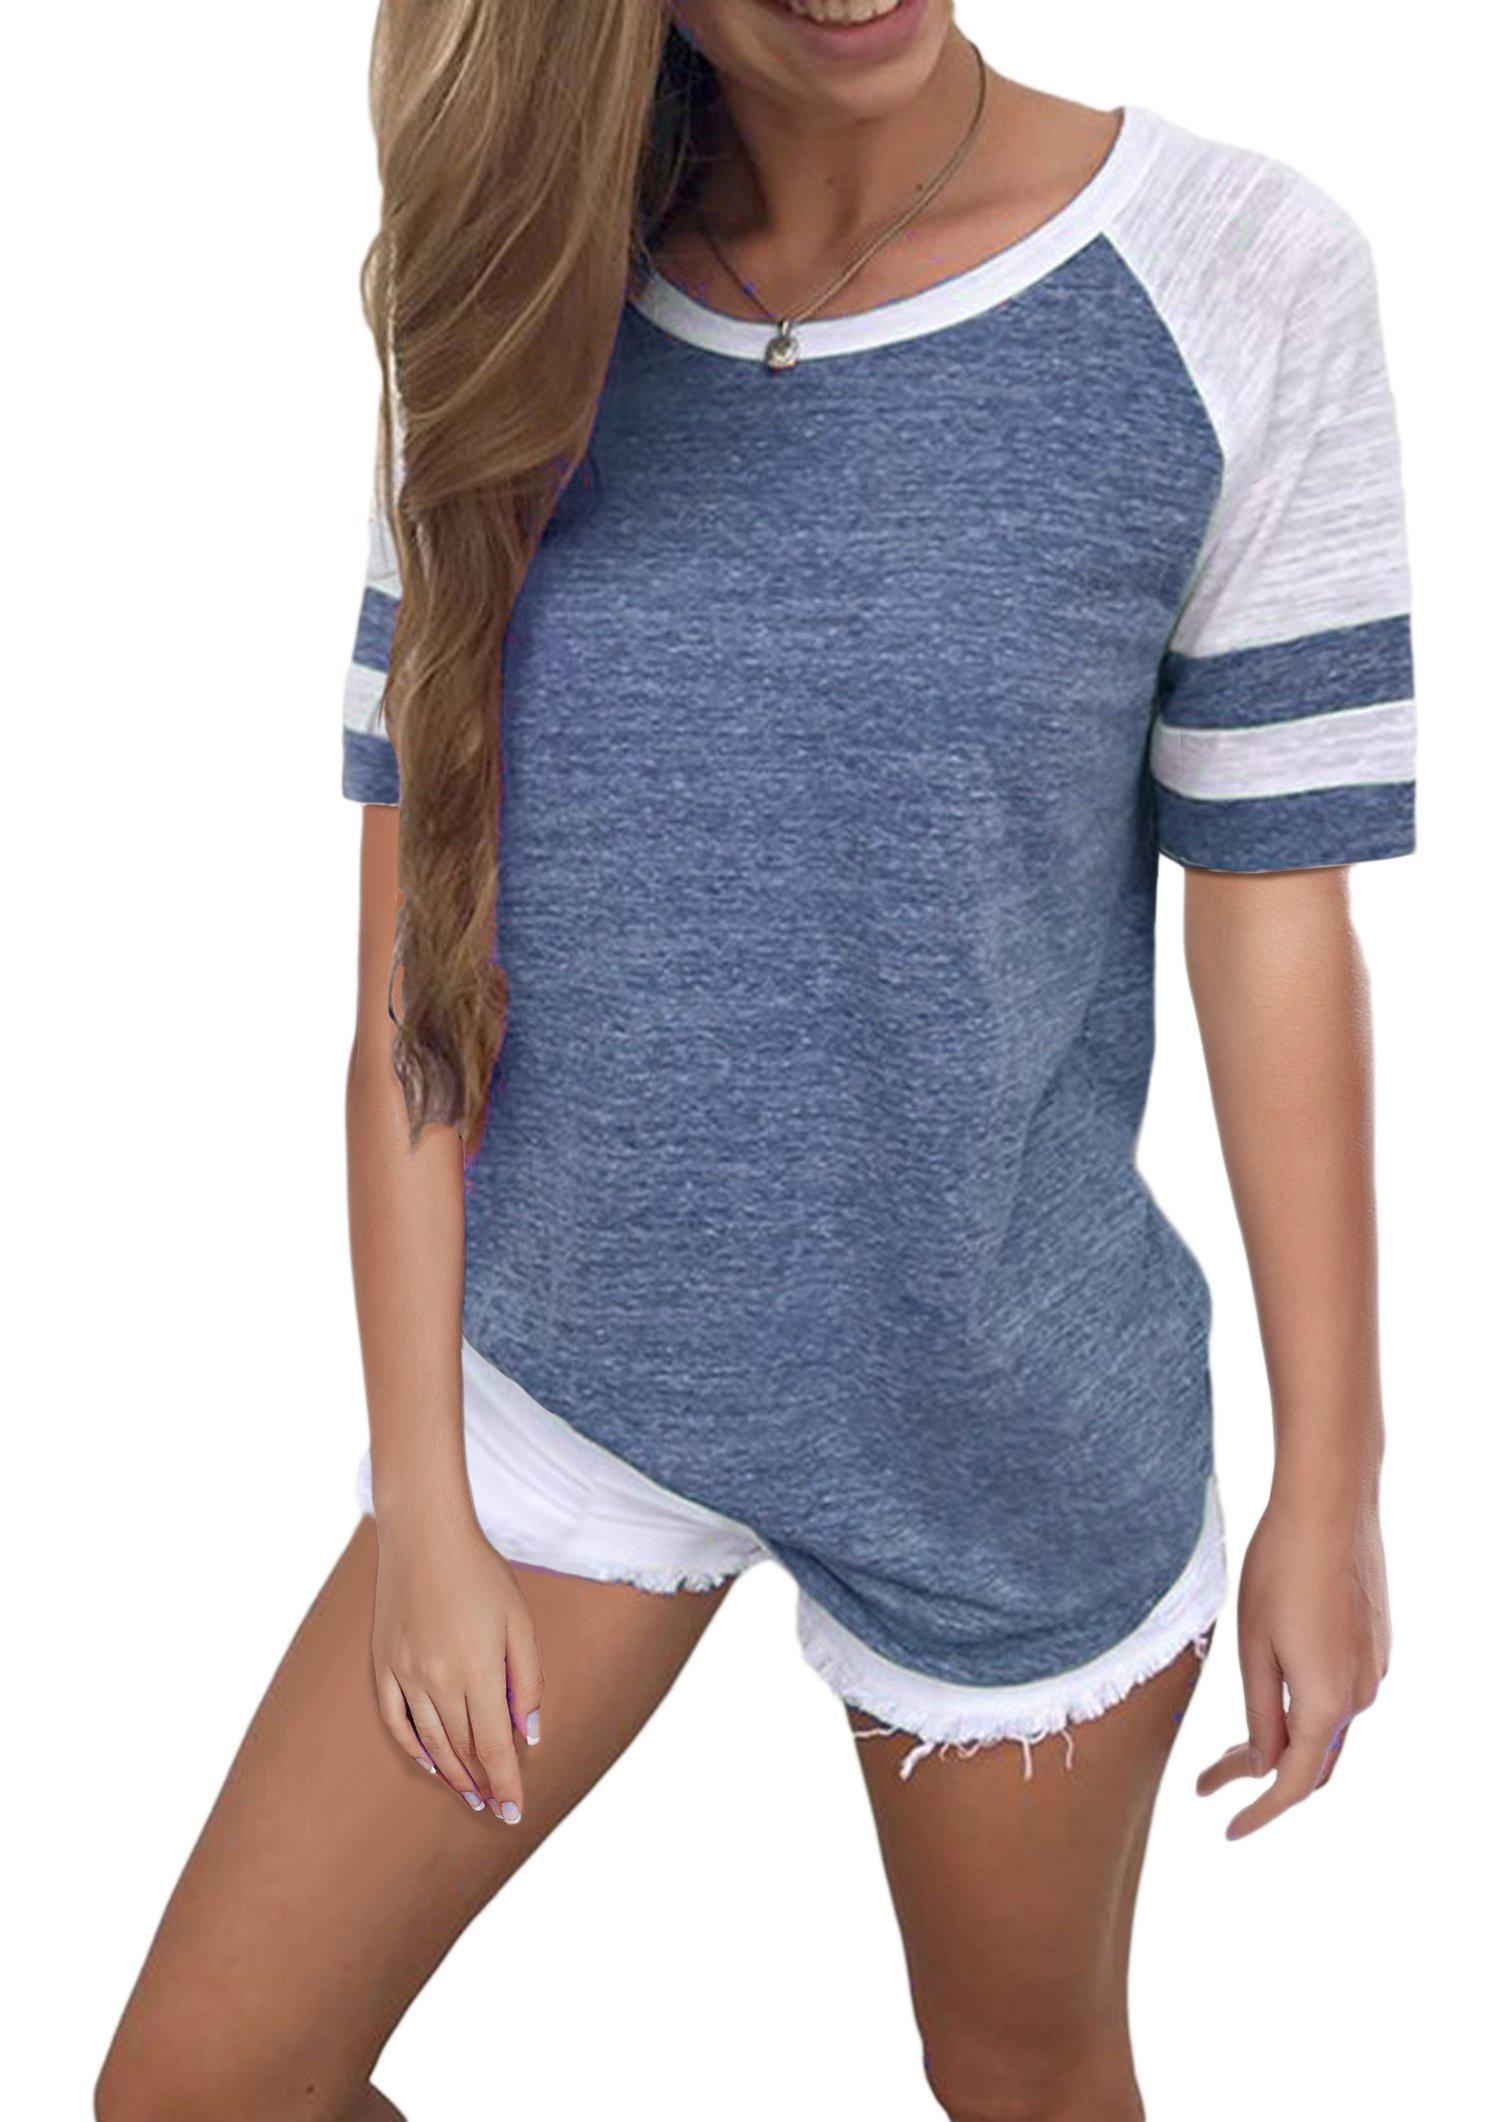 Yidarton Women's Color Block Short Sleeve T Shirt Casual Round Neck Tunic Tops(Blue,S)